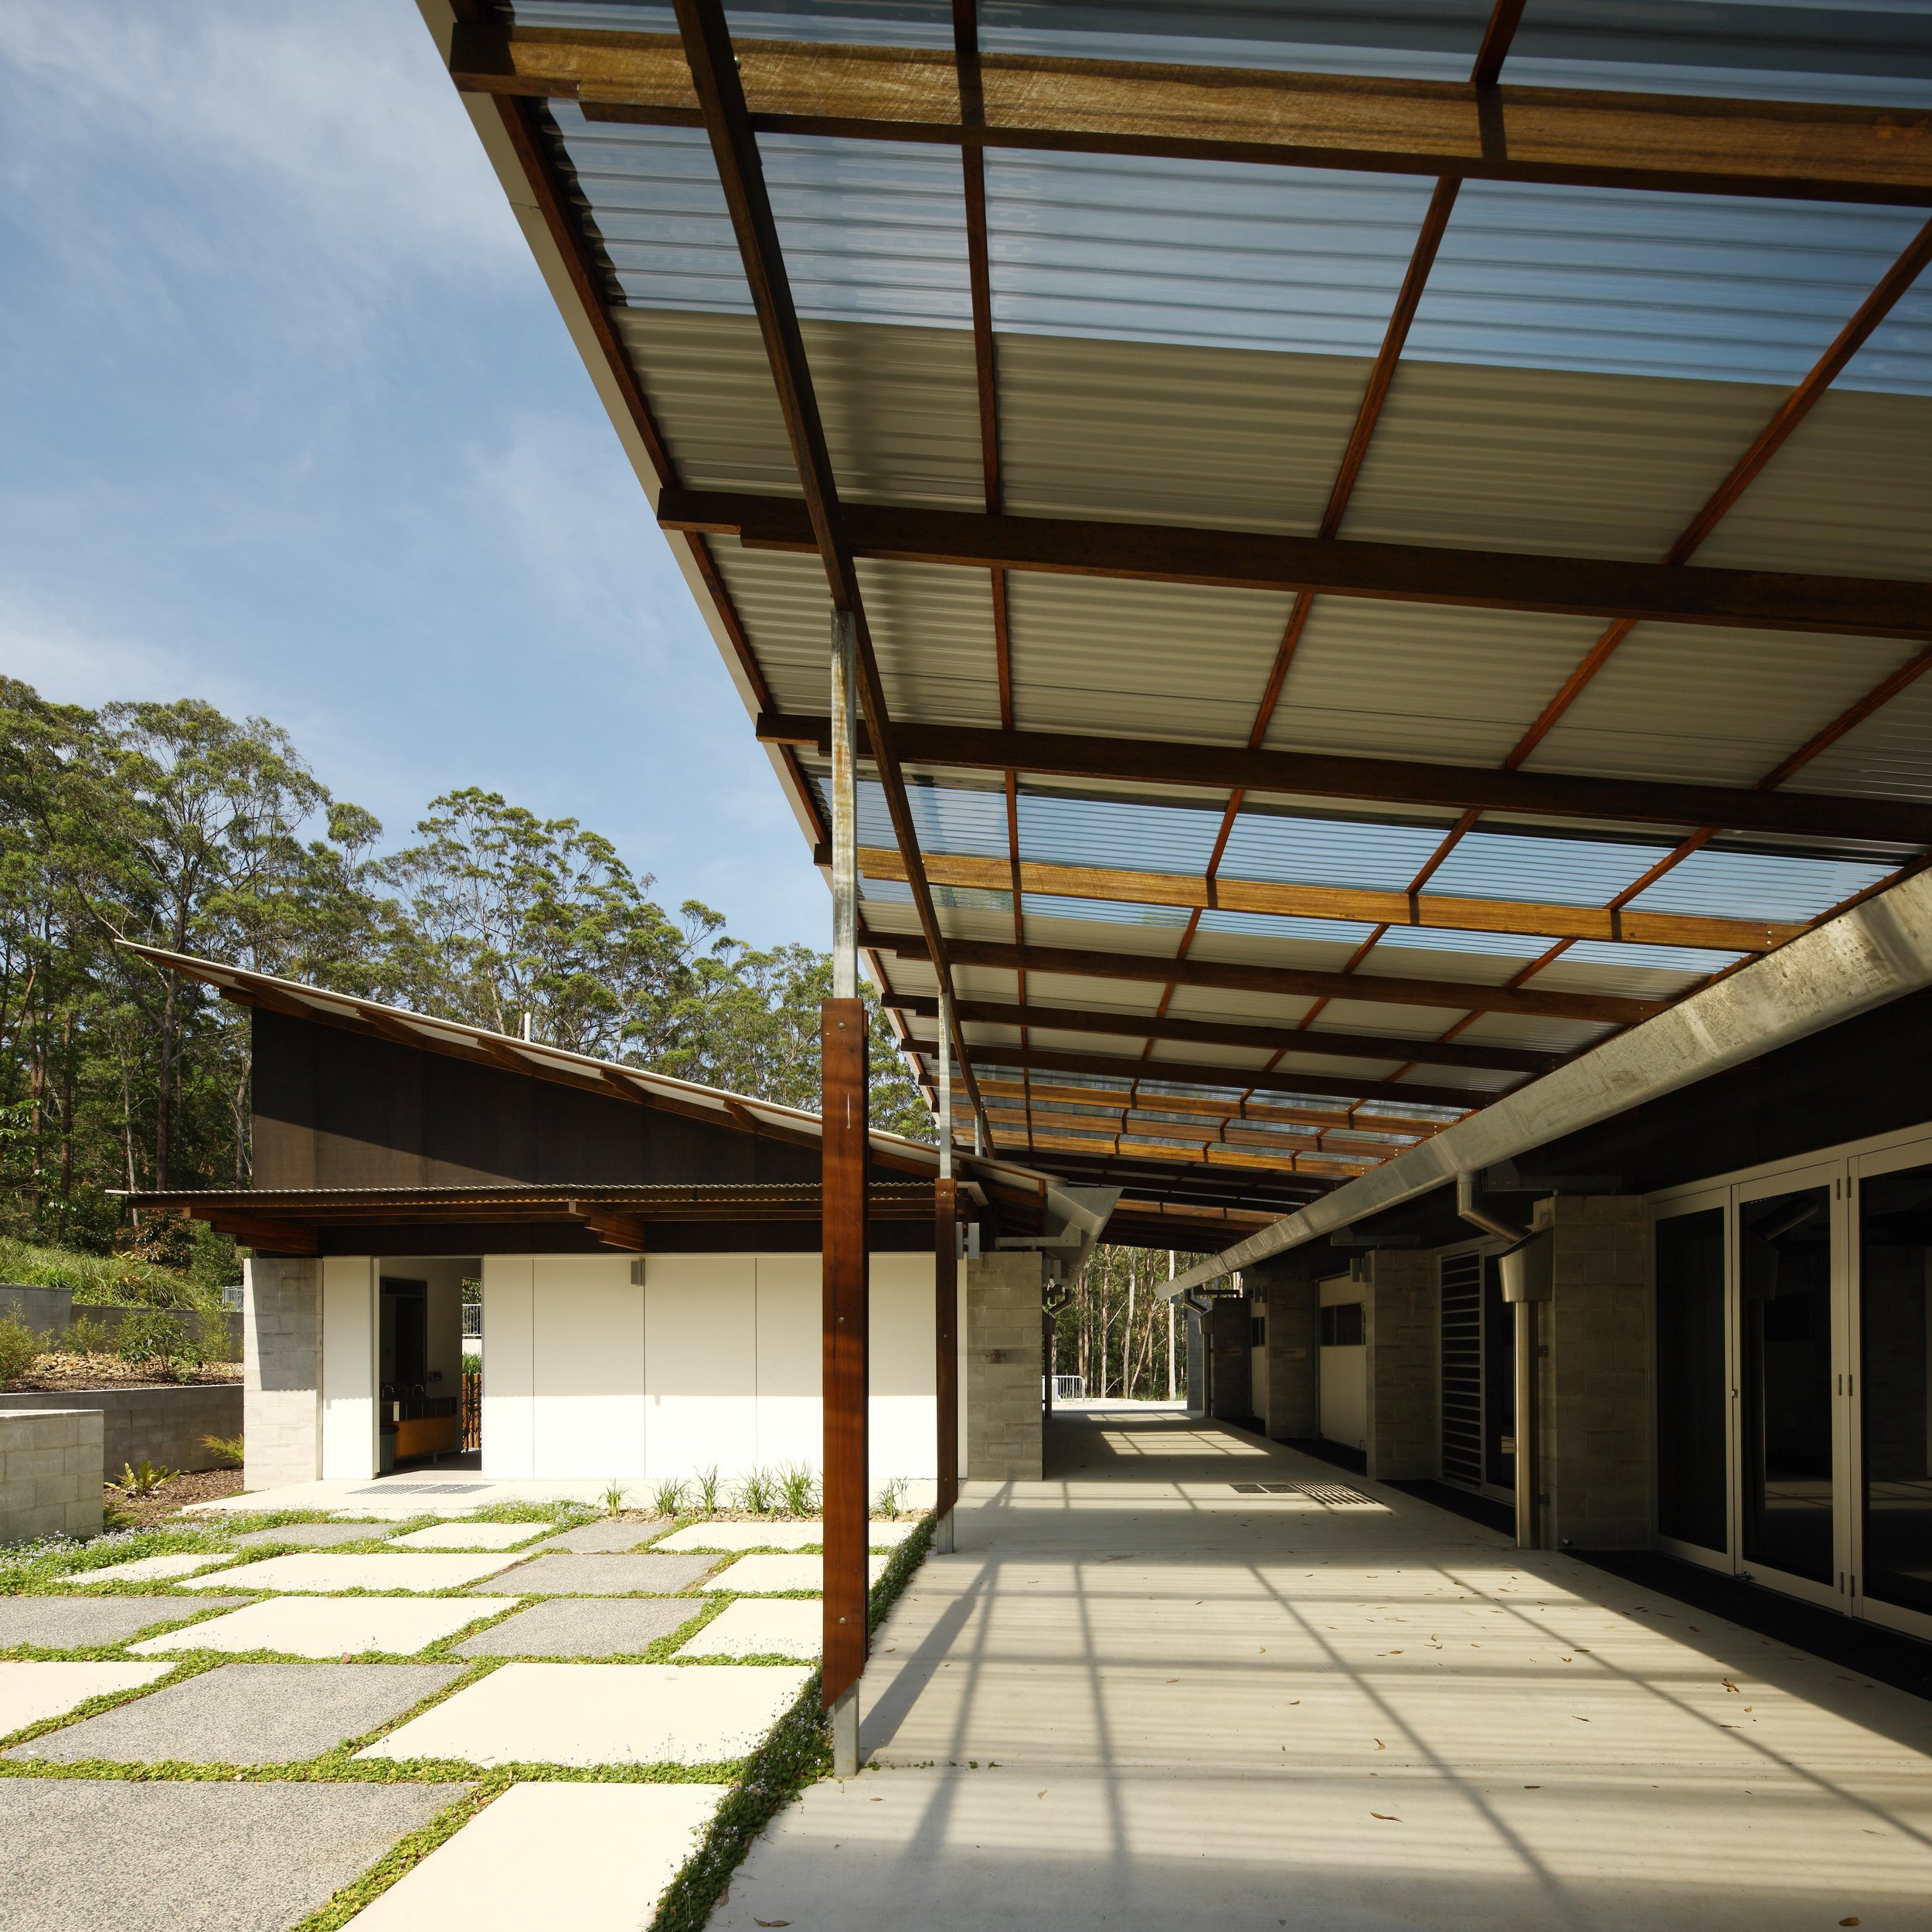 Maroochy-Botanic-Gardens-Guymer-Bailey-Architects-12.jpg